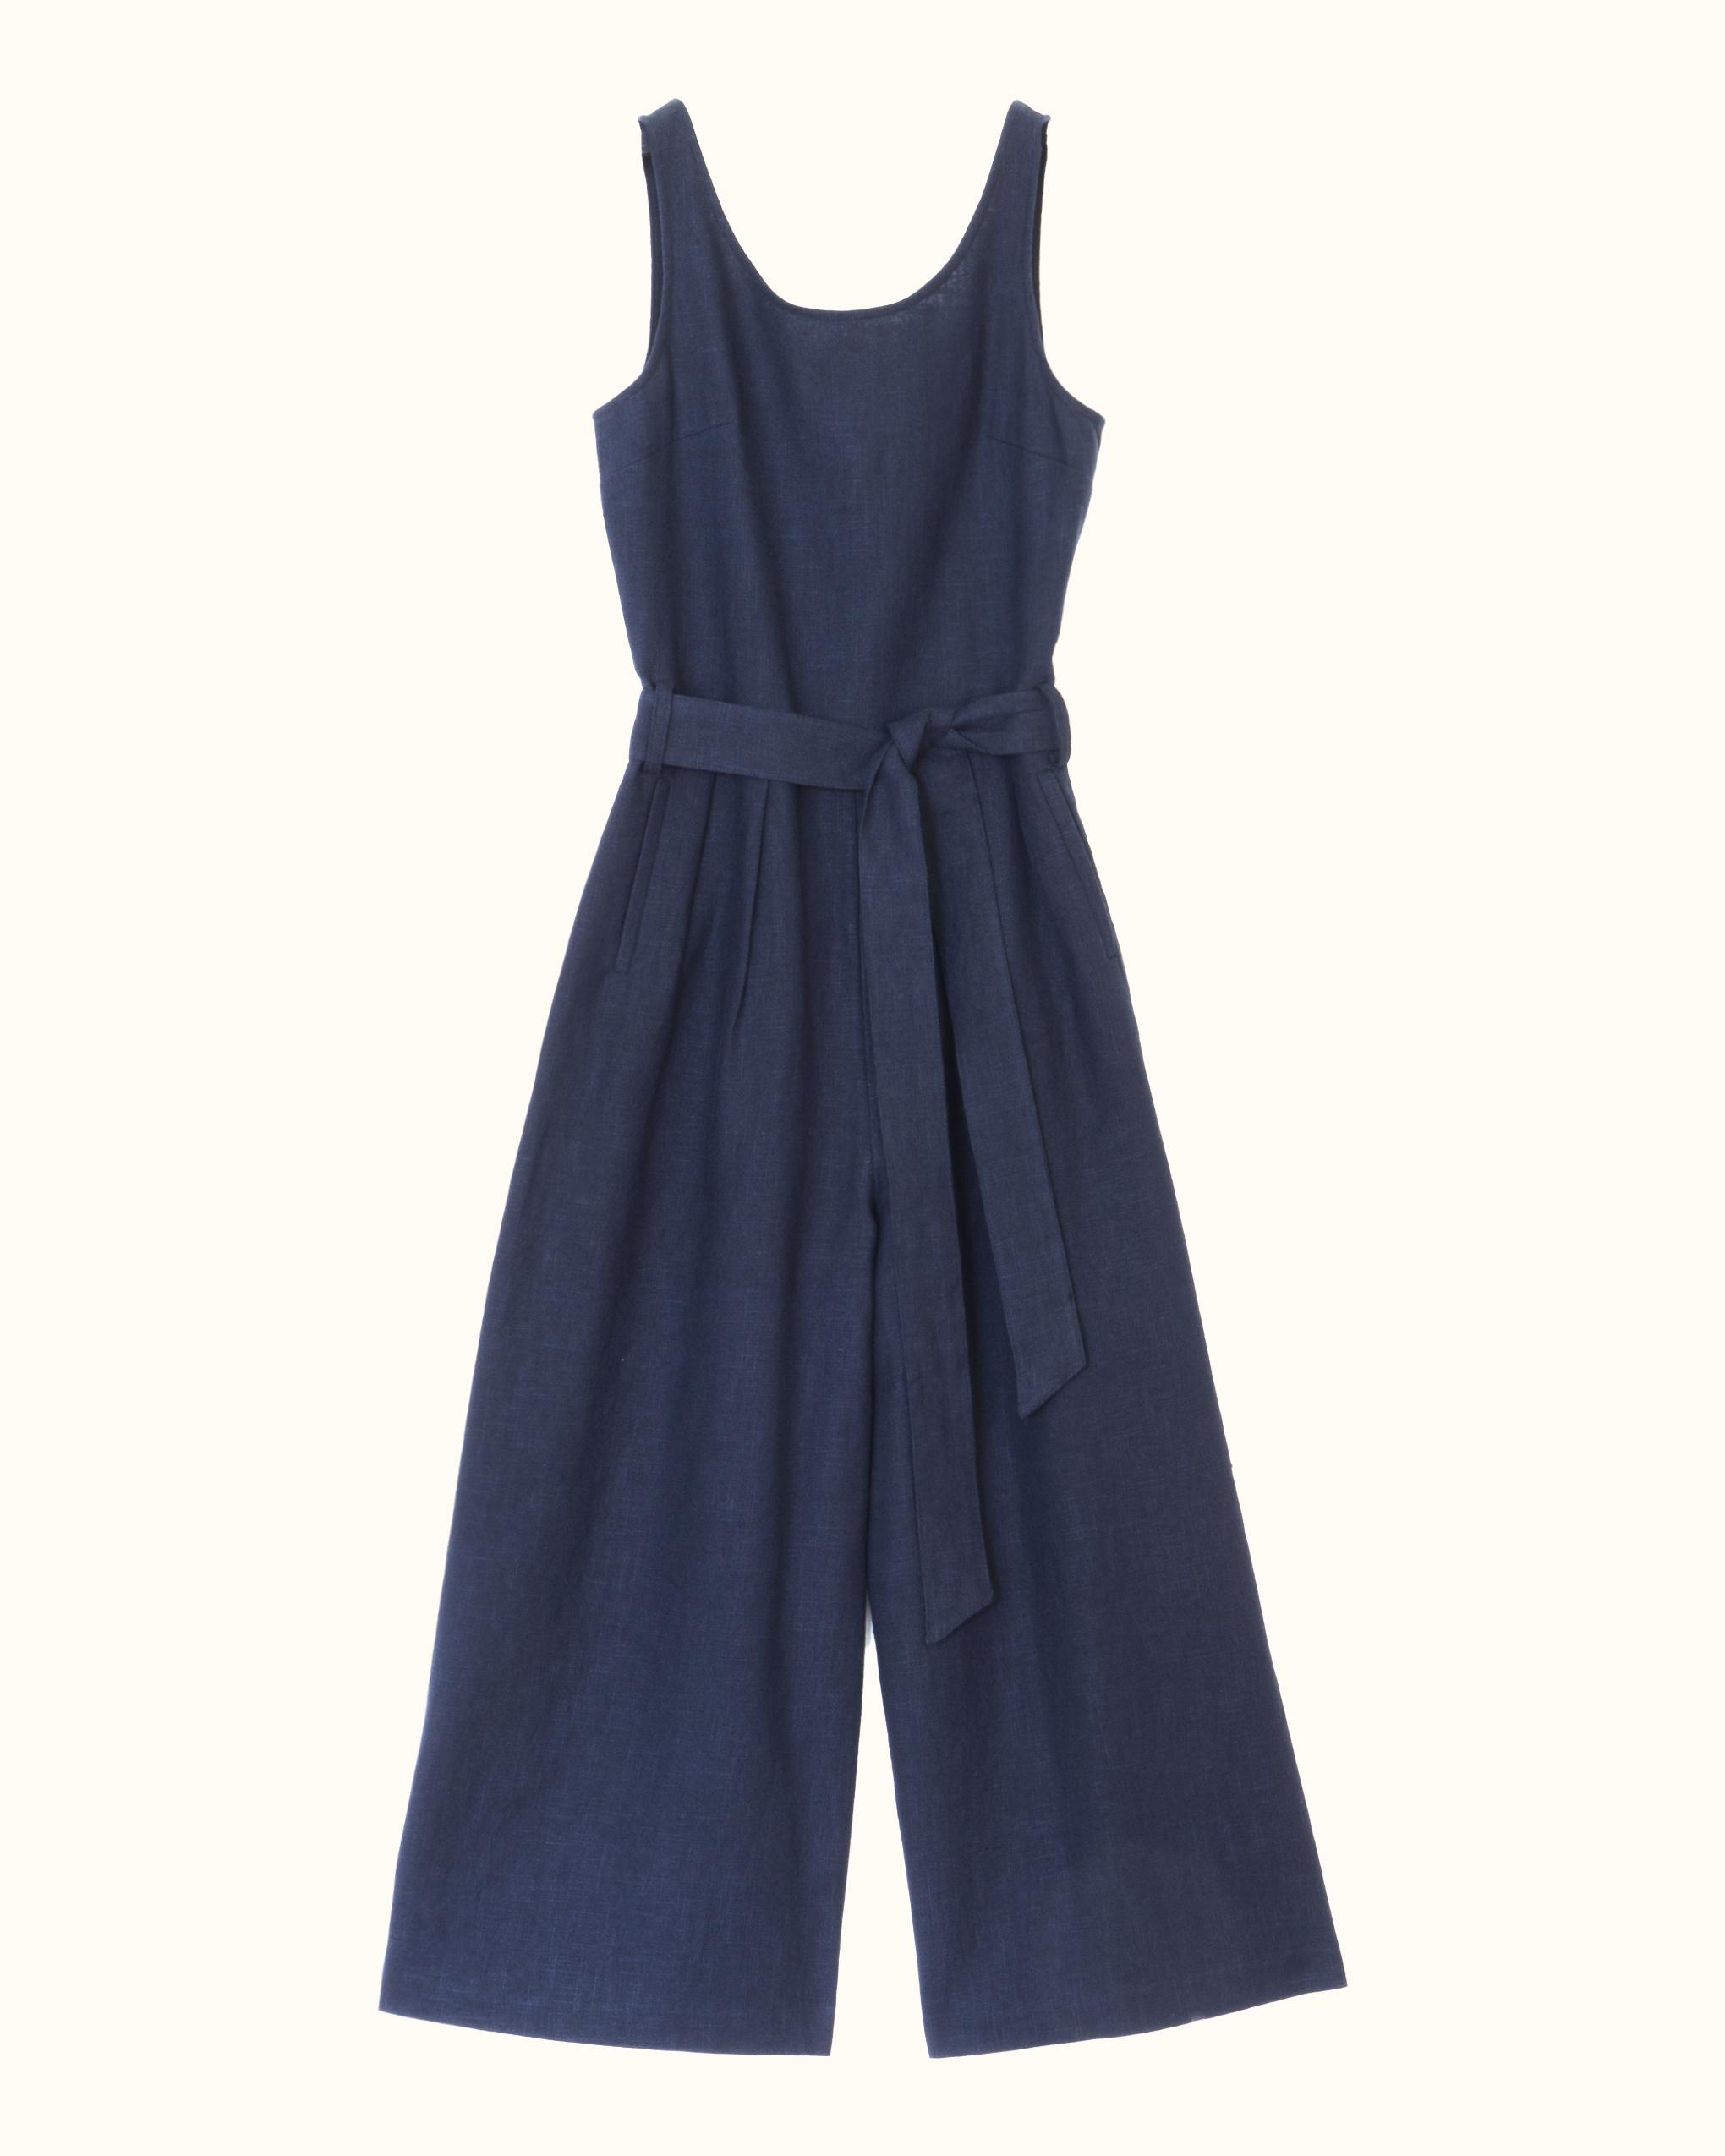 Navy sleeveless scoop back linen jumpsuit.